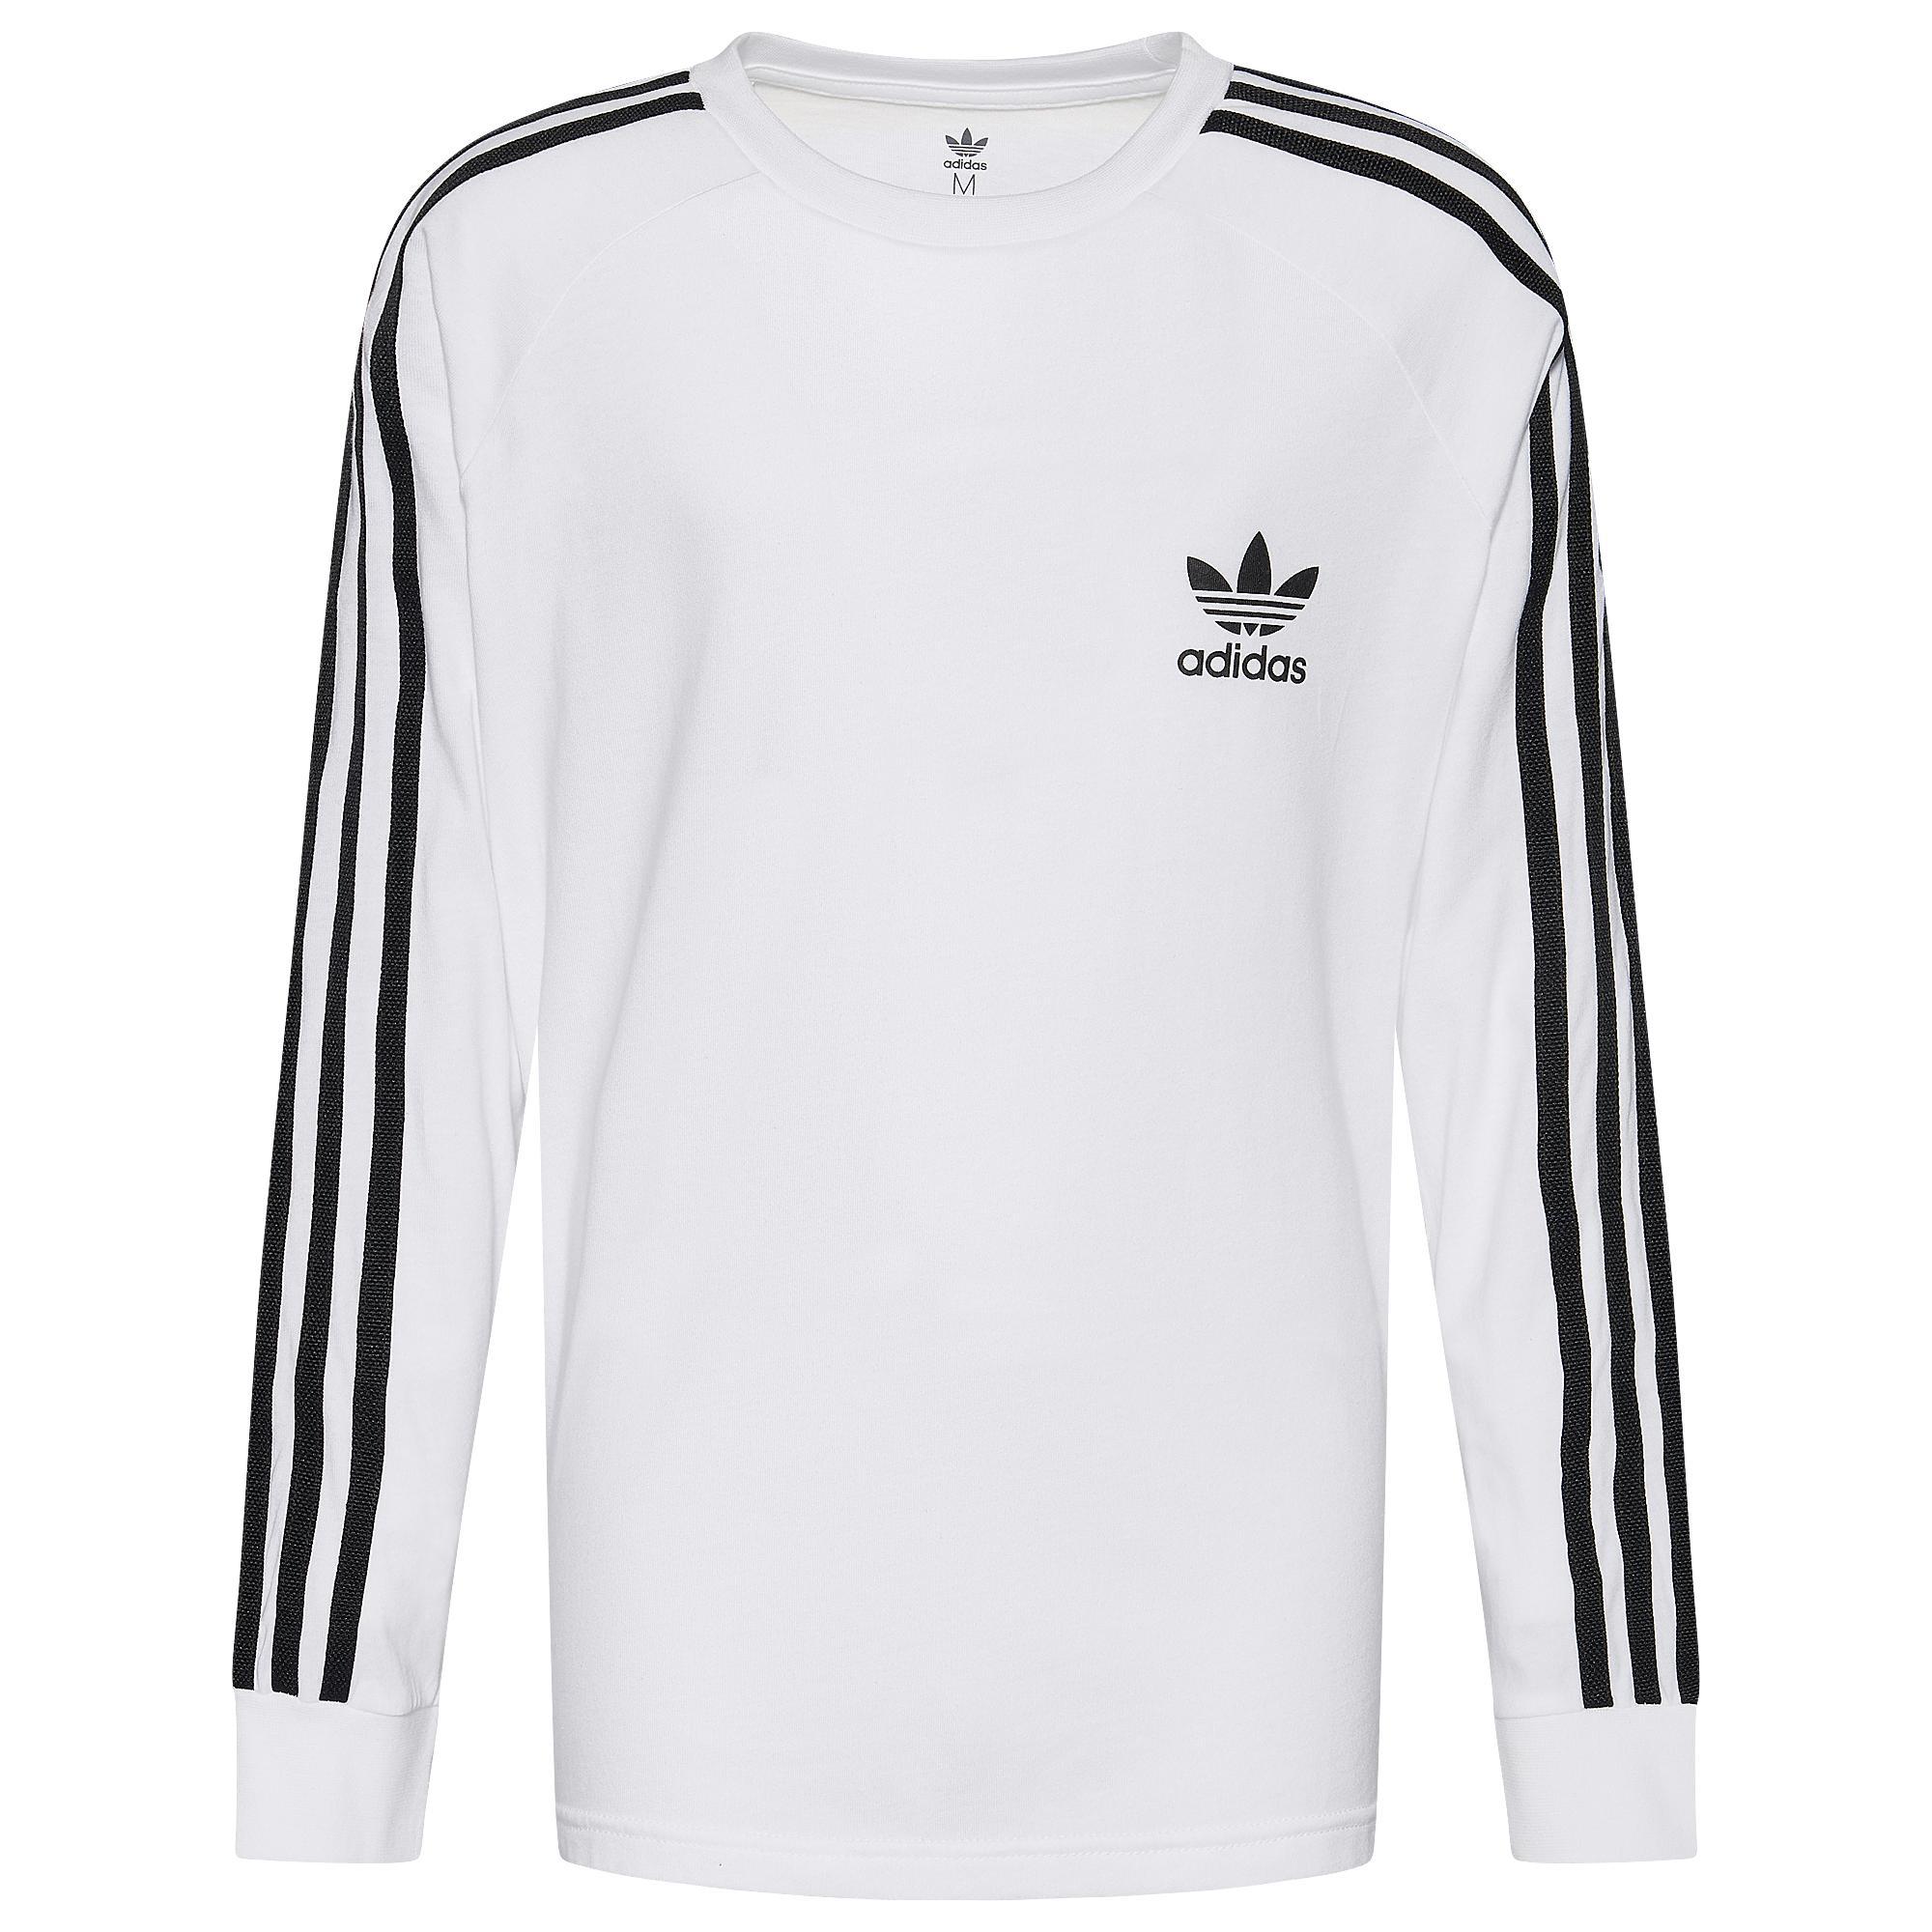 Adidas Originals Long Sleeve 3 Stripes T Shirt WhiteBlack